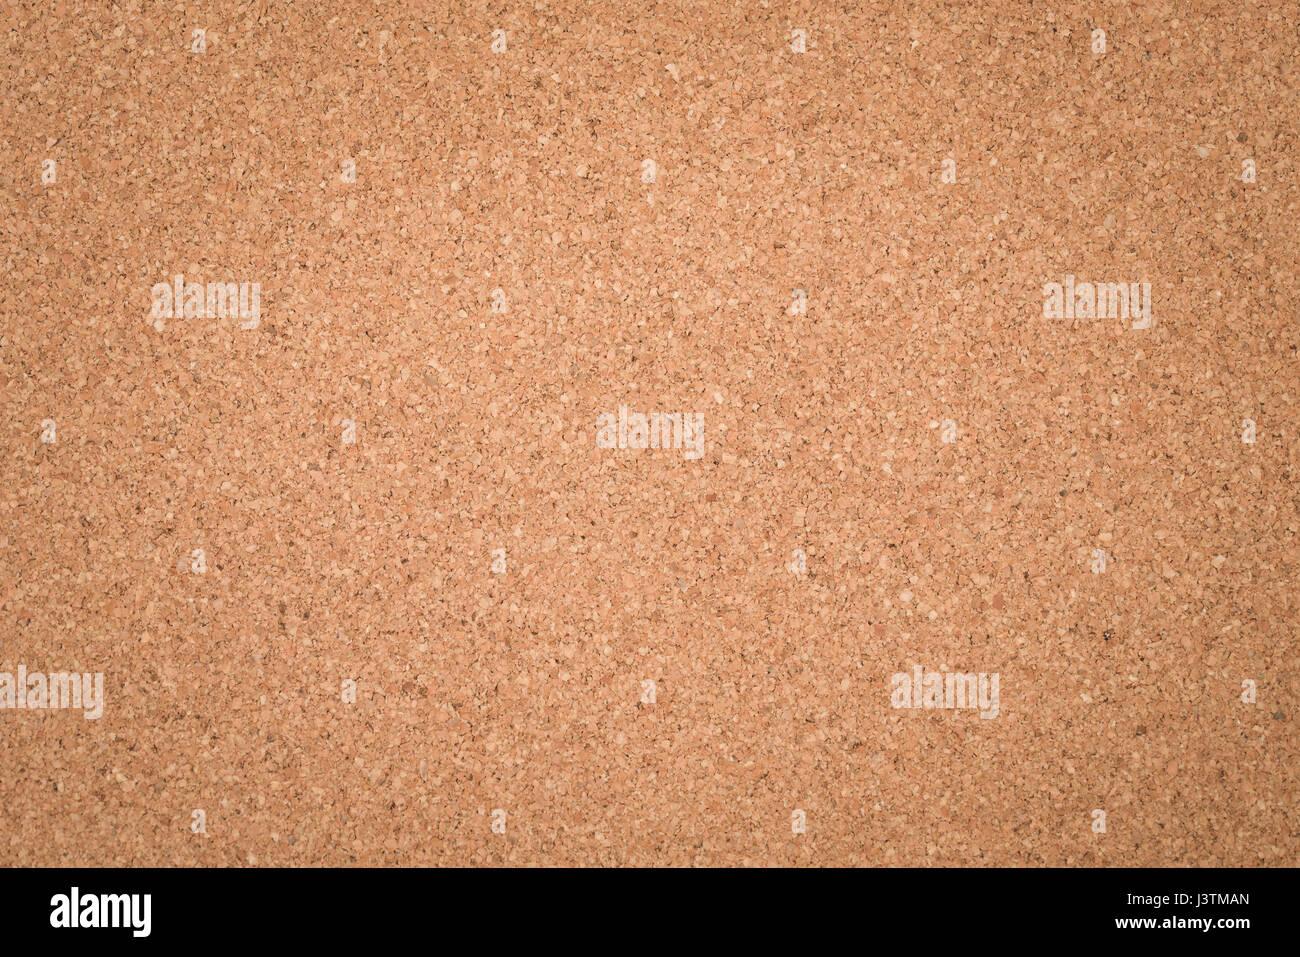 Empty Cork Board Texture - Stock Image